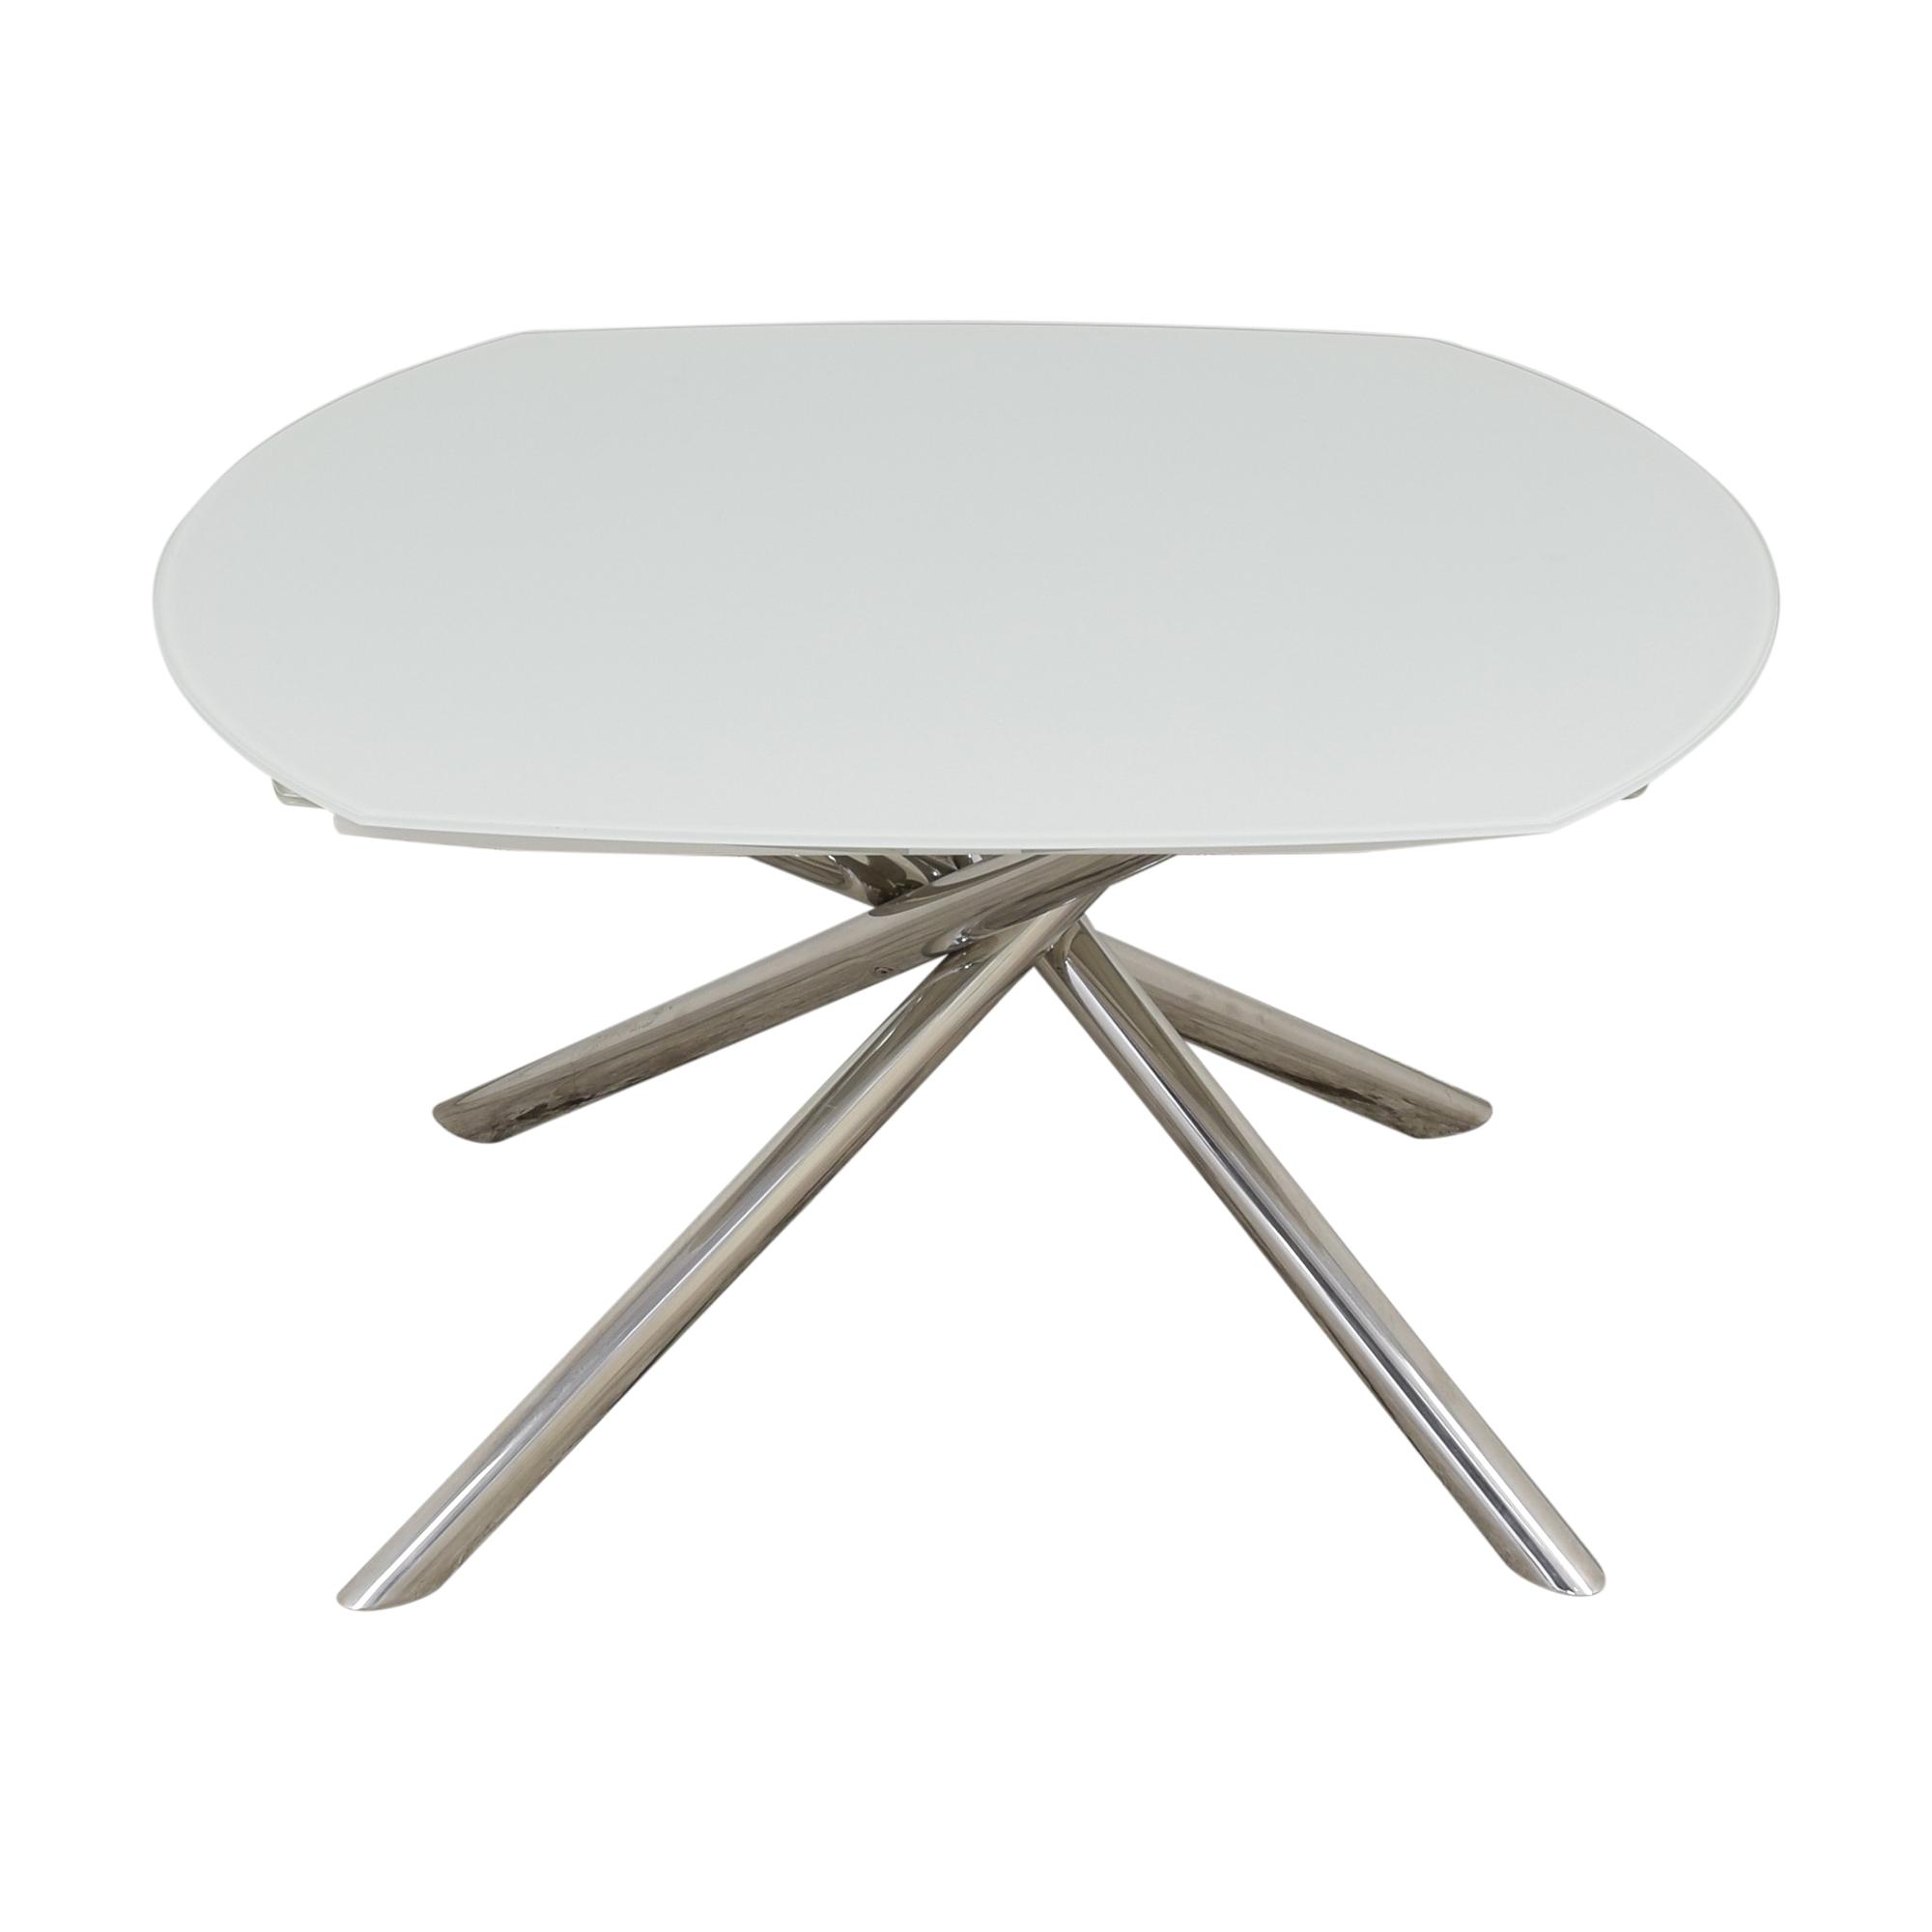 Modani Modani Astro Extendable Dining Table nj